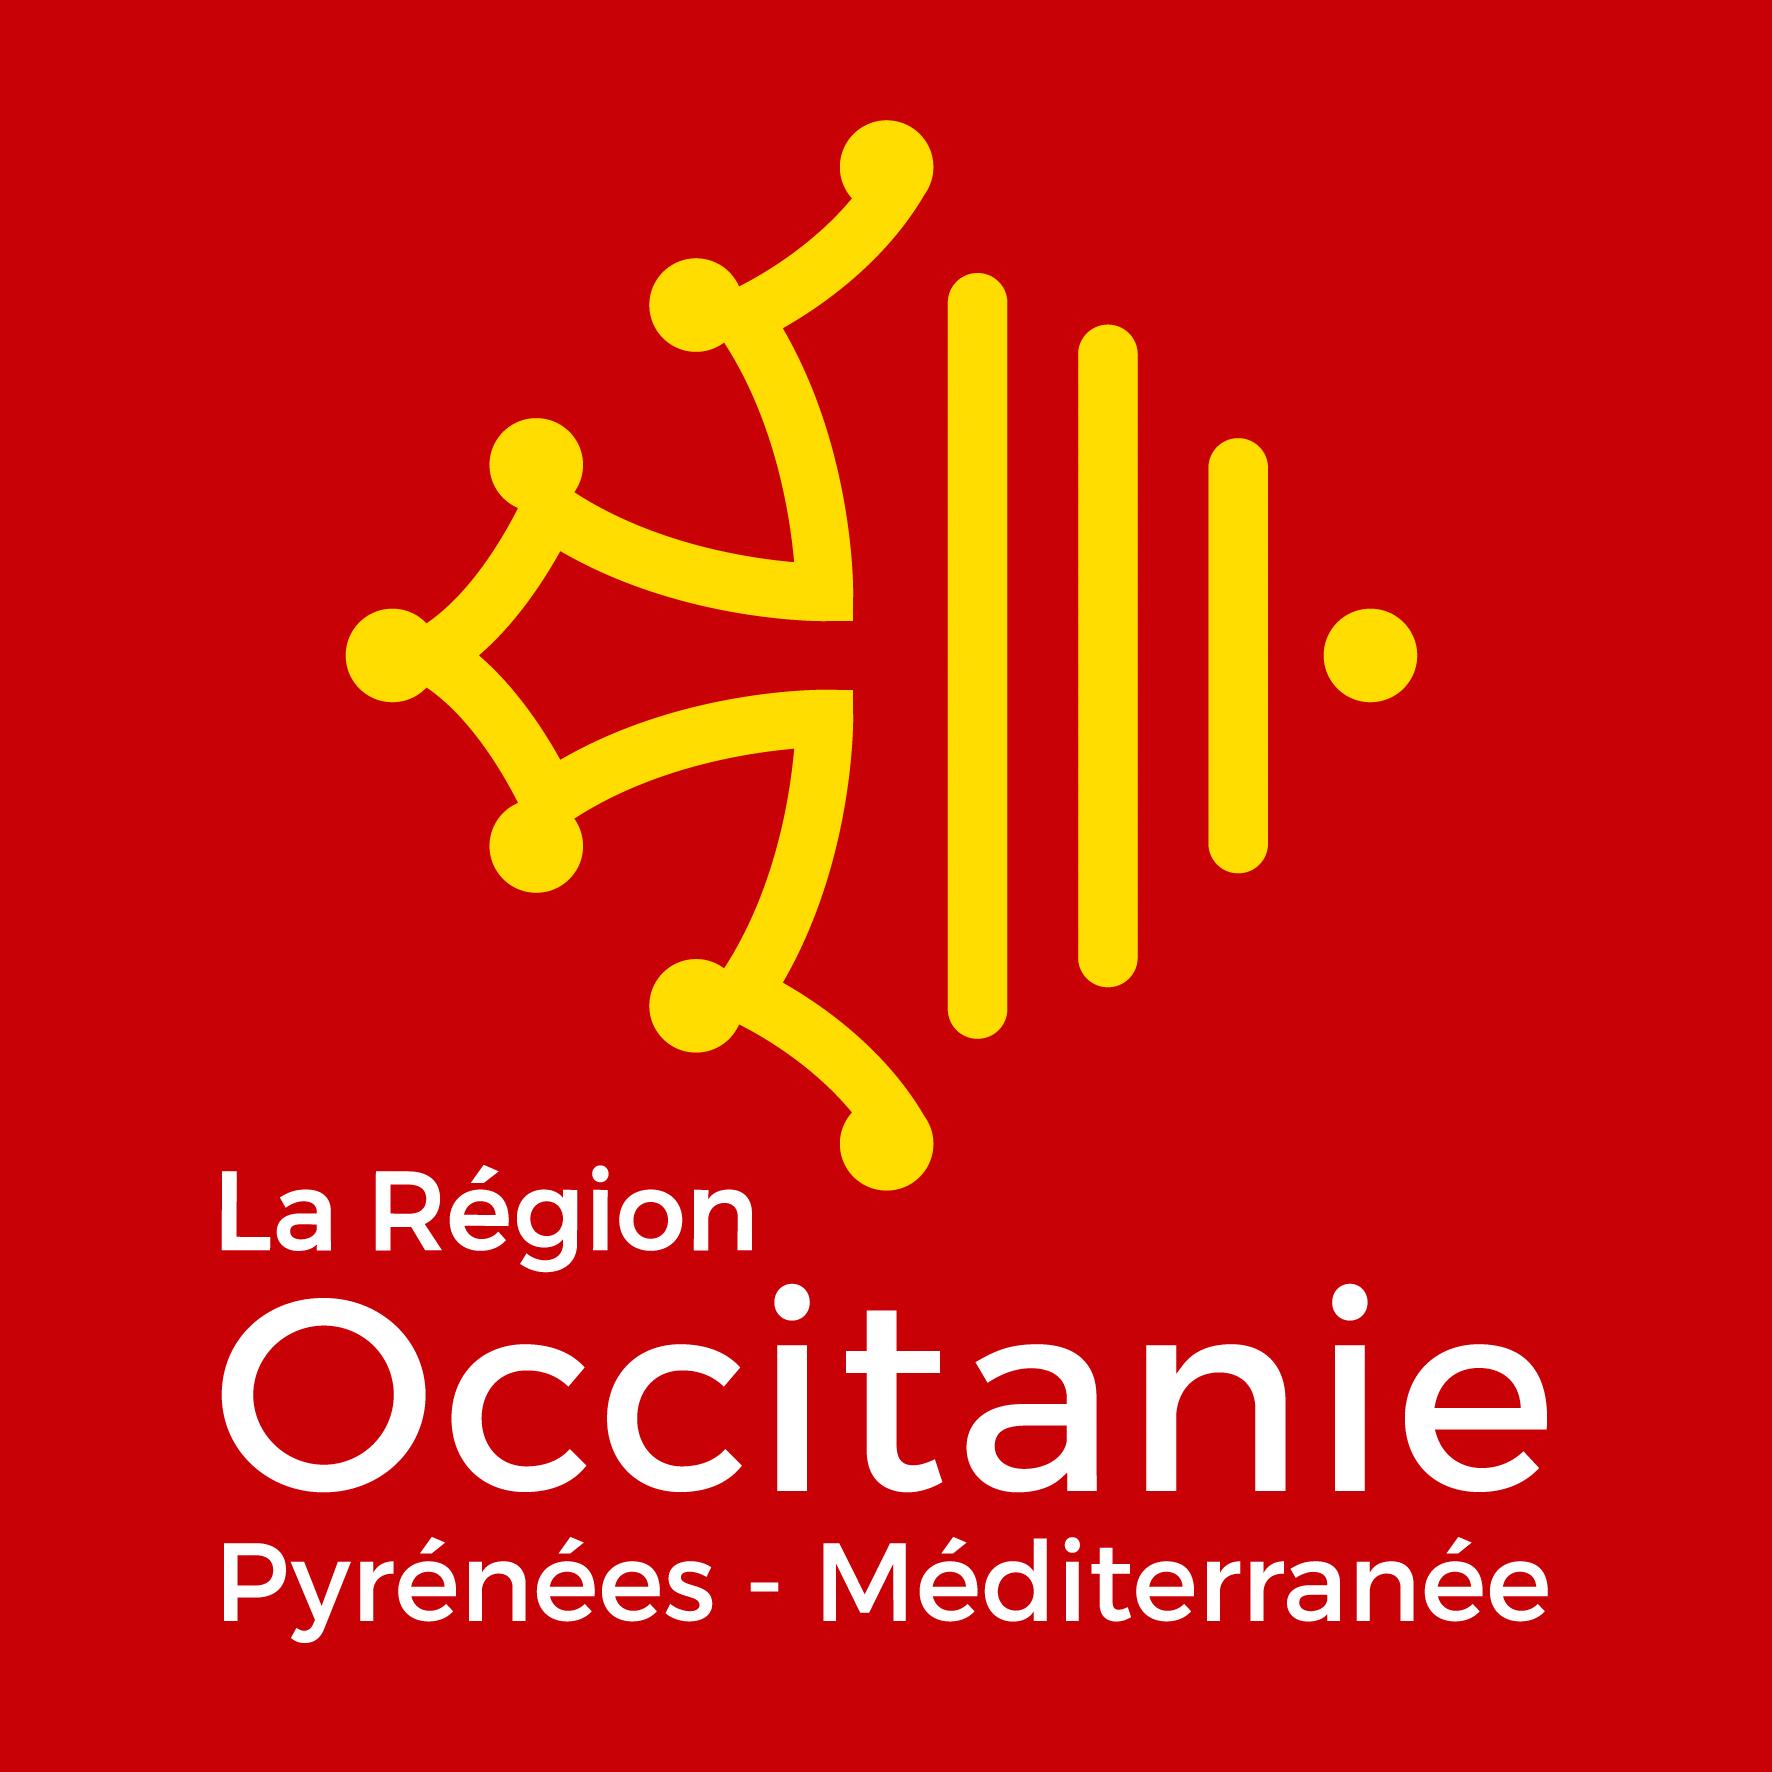 OC-1702-instit-logo carre-RVB-150x150-300dpi.png